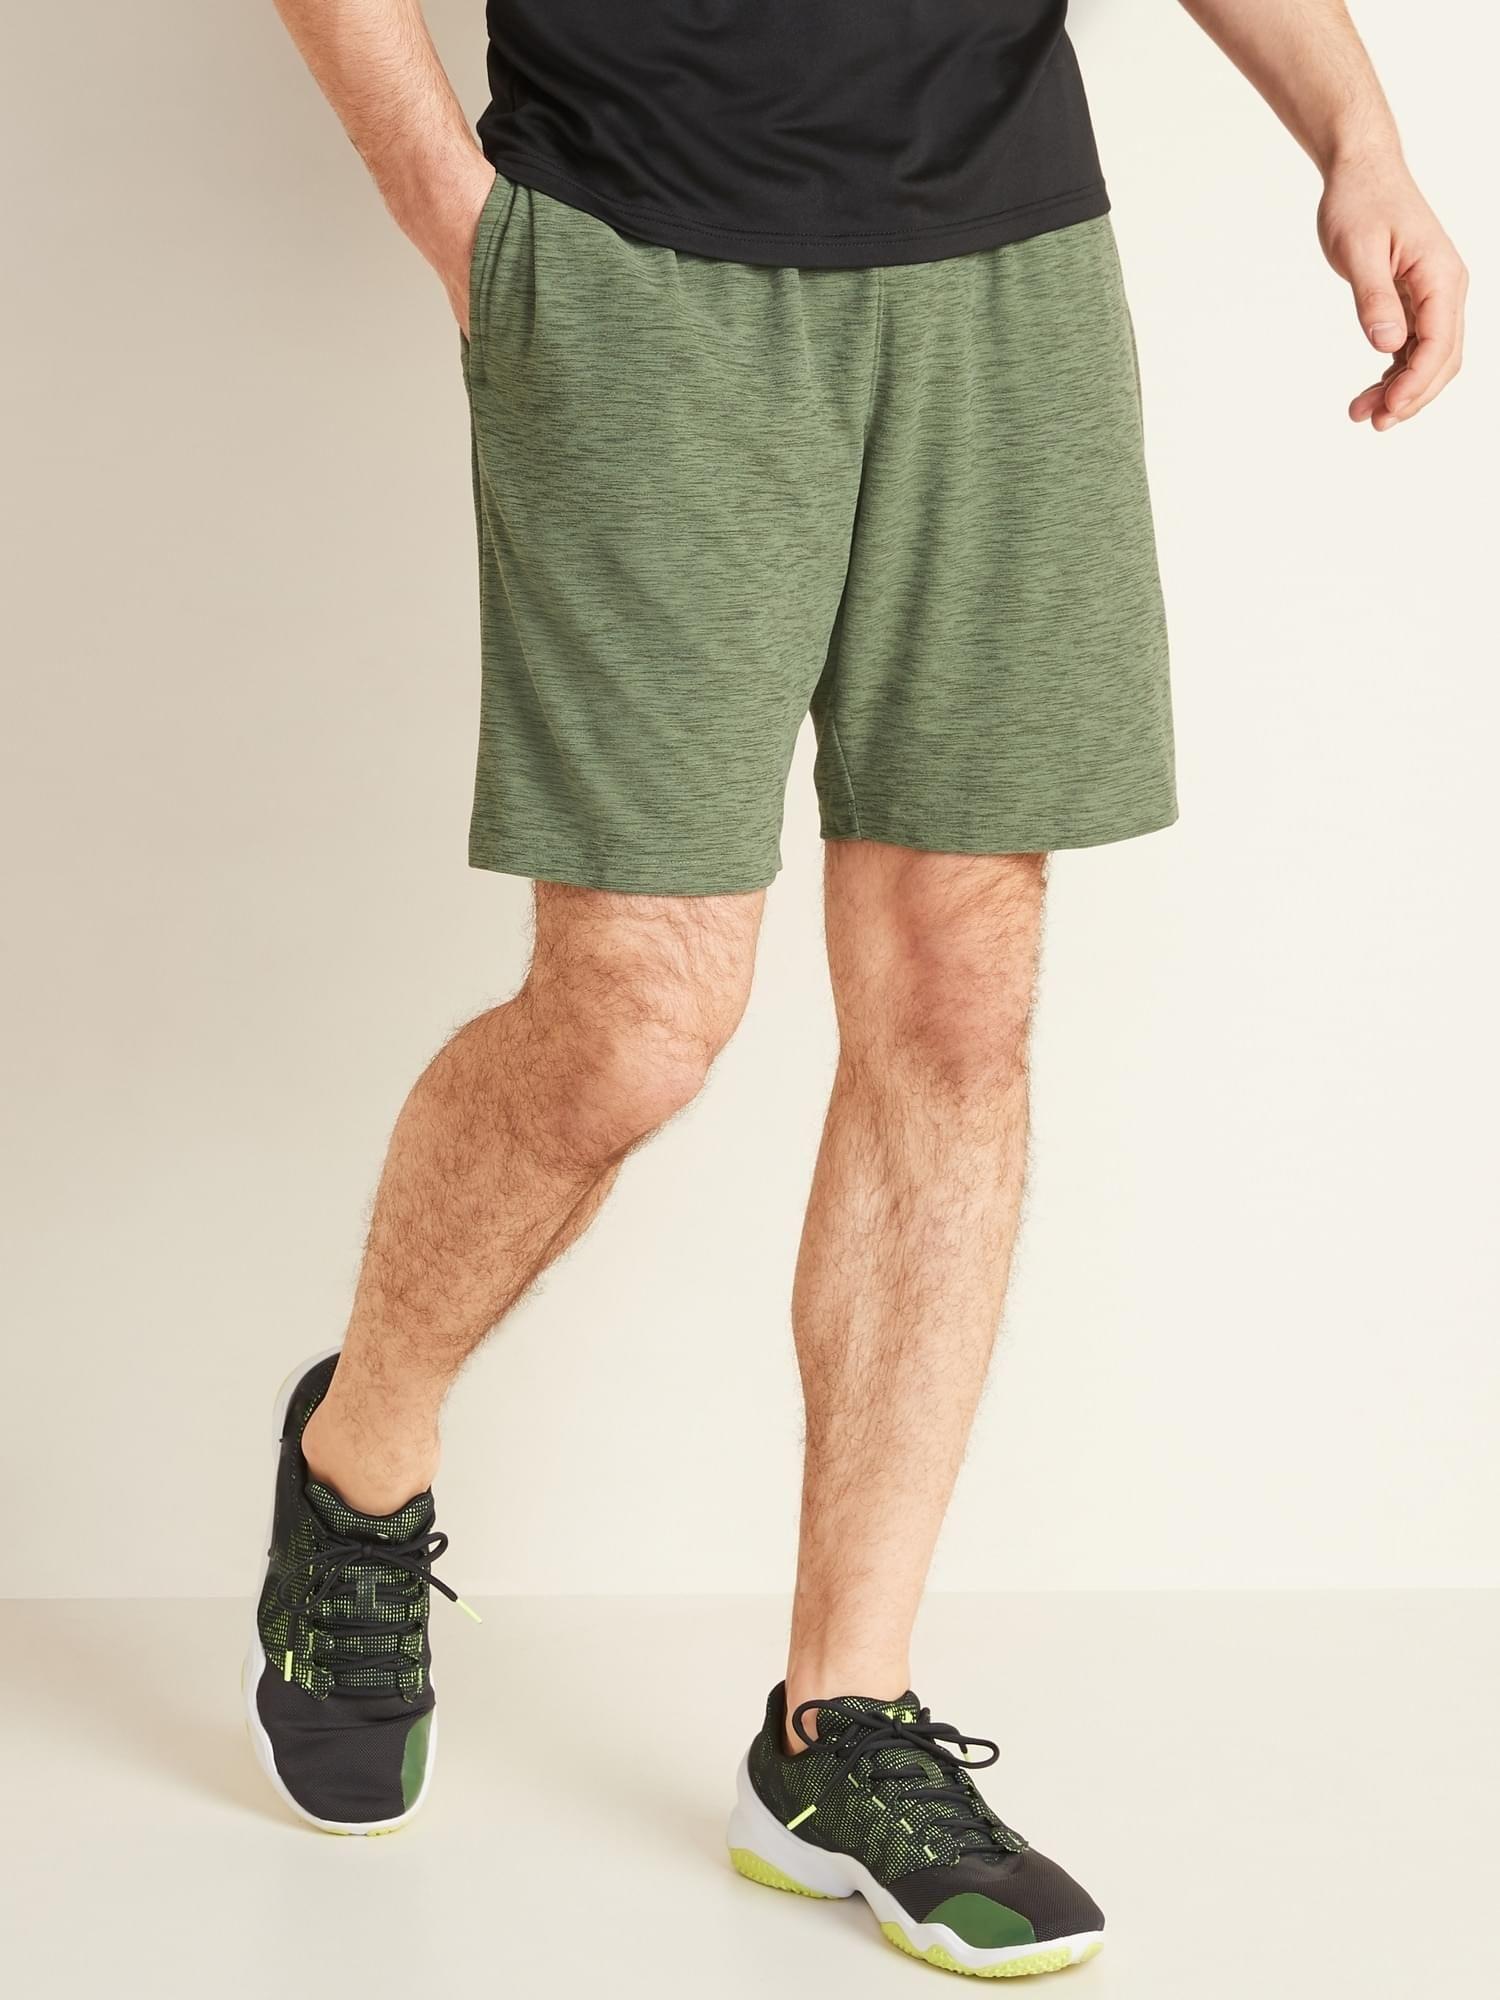 UltraSoft Breathe ON Shorts for Men 9inch inseam in